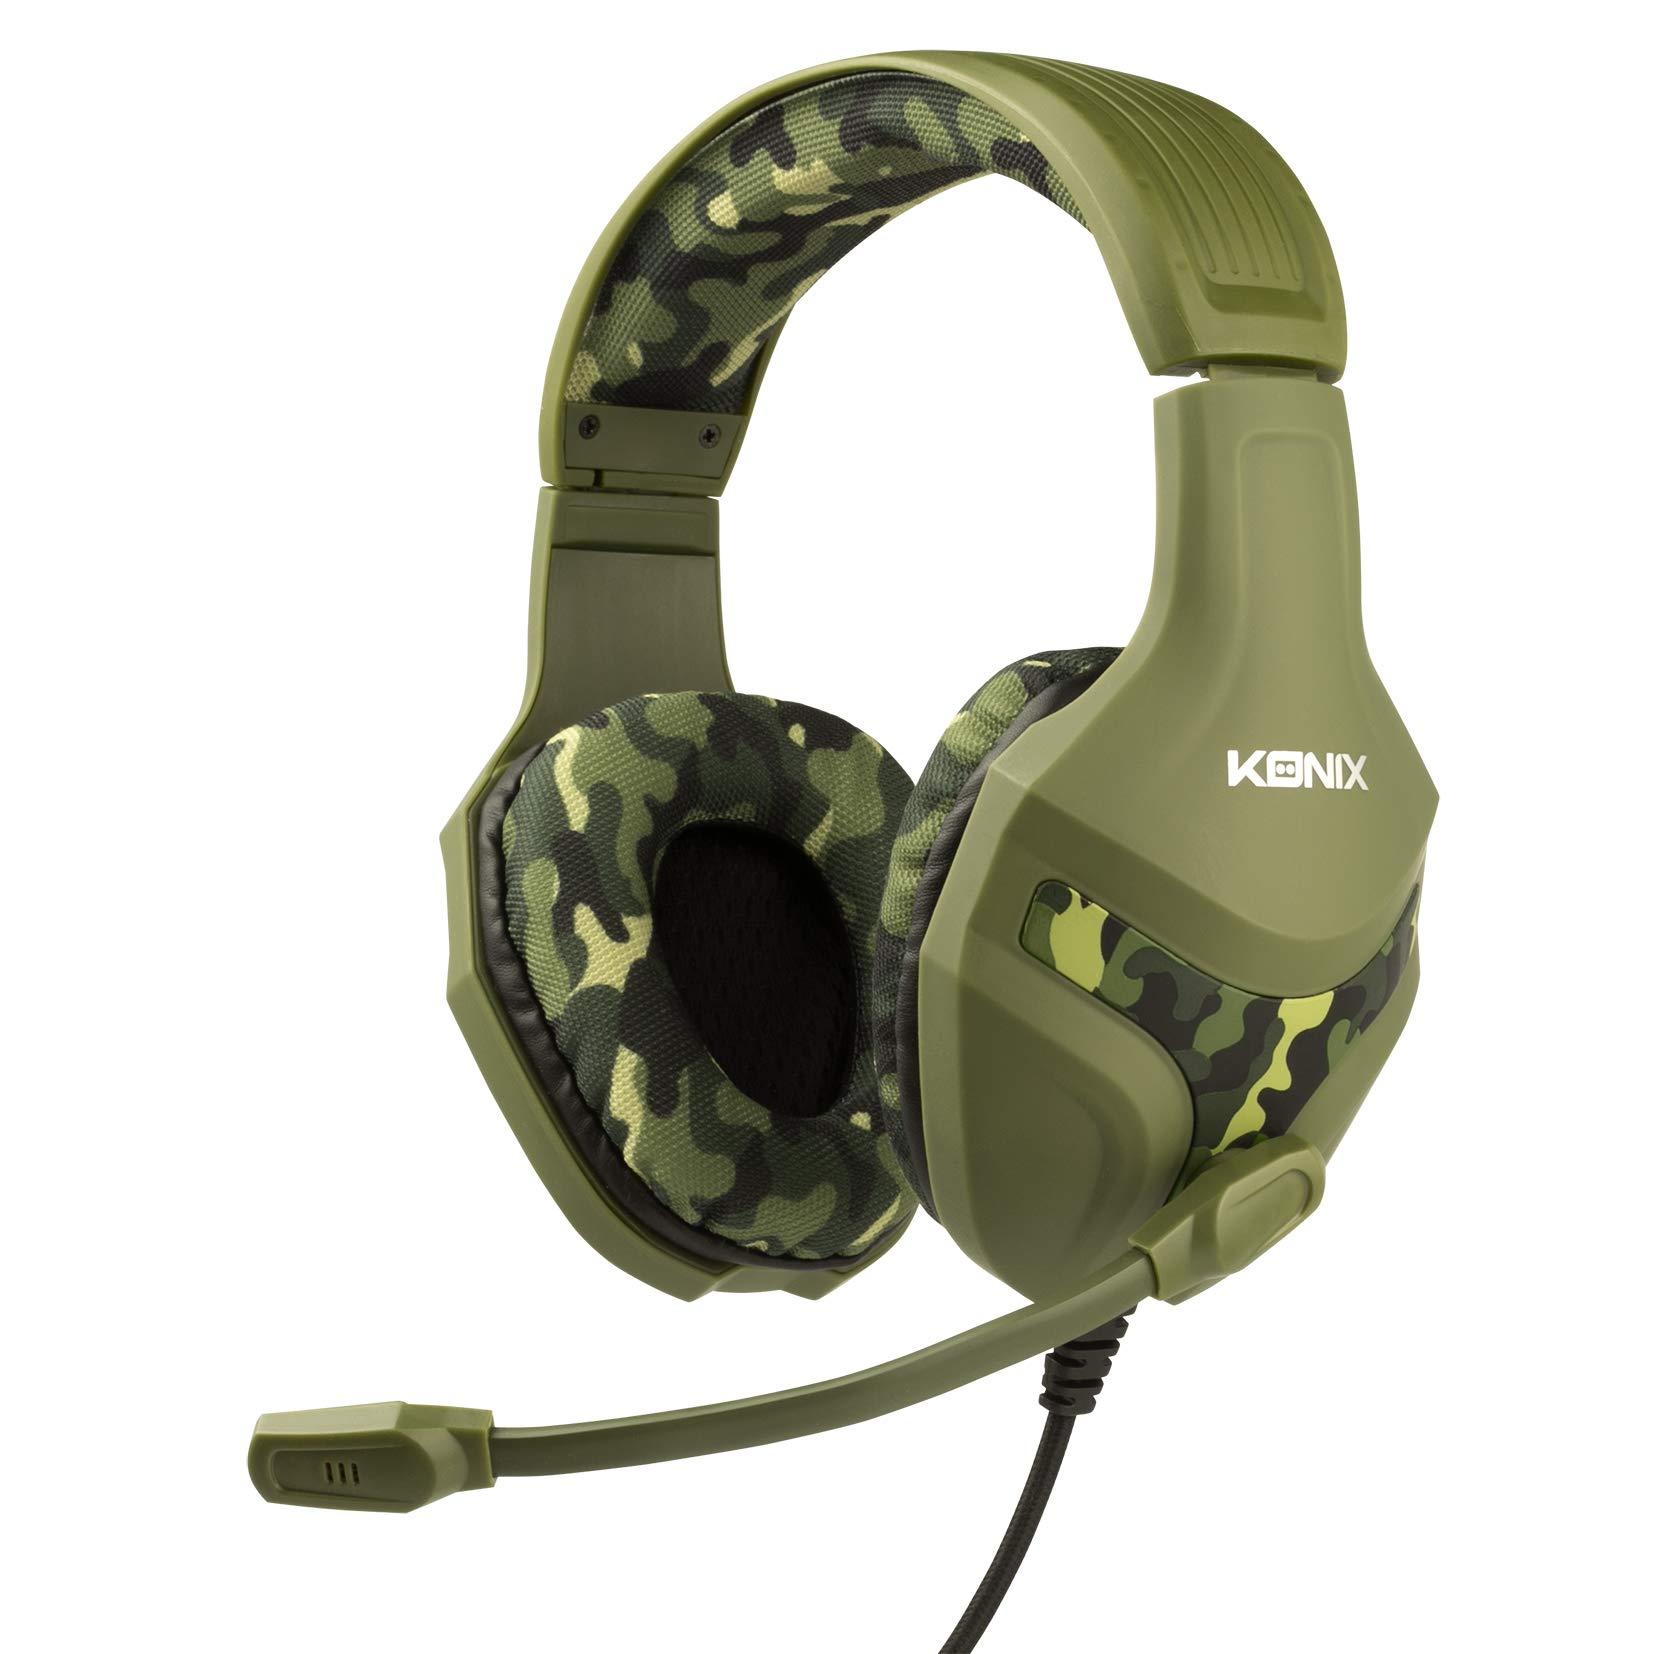 Konix PS-400 Camo – Casque Gaming PS4 Camouflage Compatible Xbox One, PC, Tablette, Smartphone – Haute Qualité Audio – Micro Casque Gamer avec Microphone